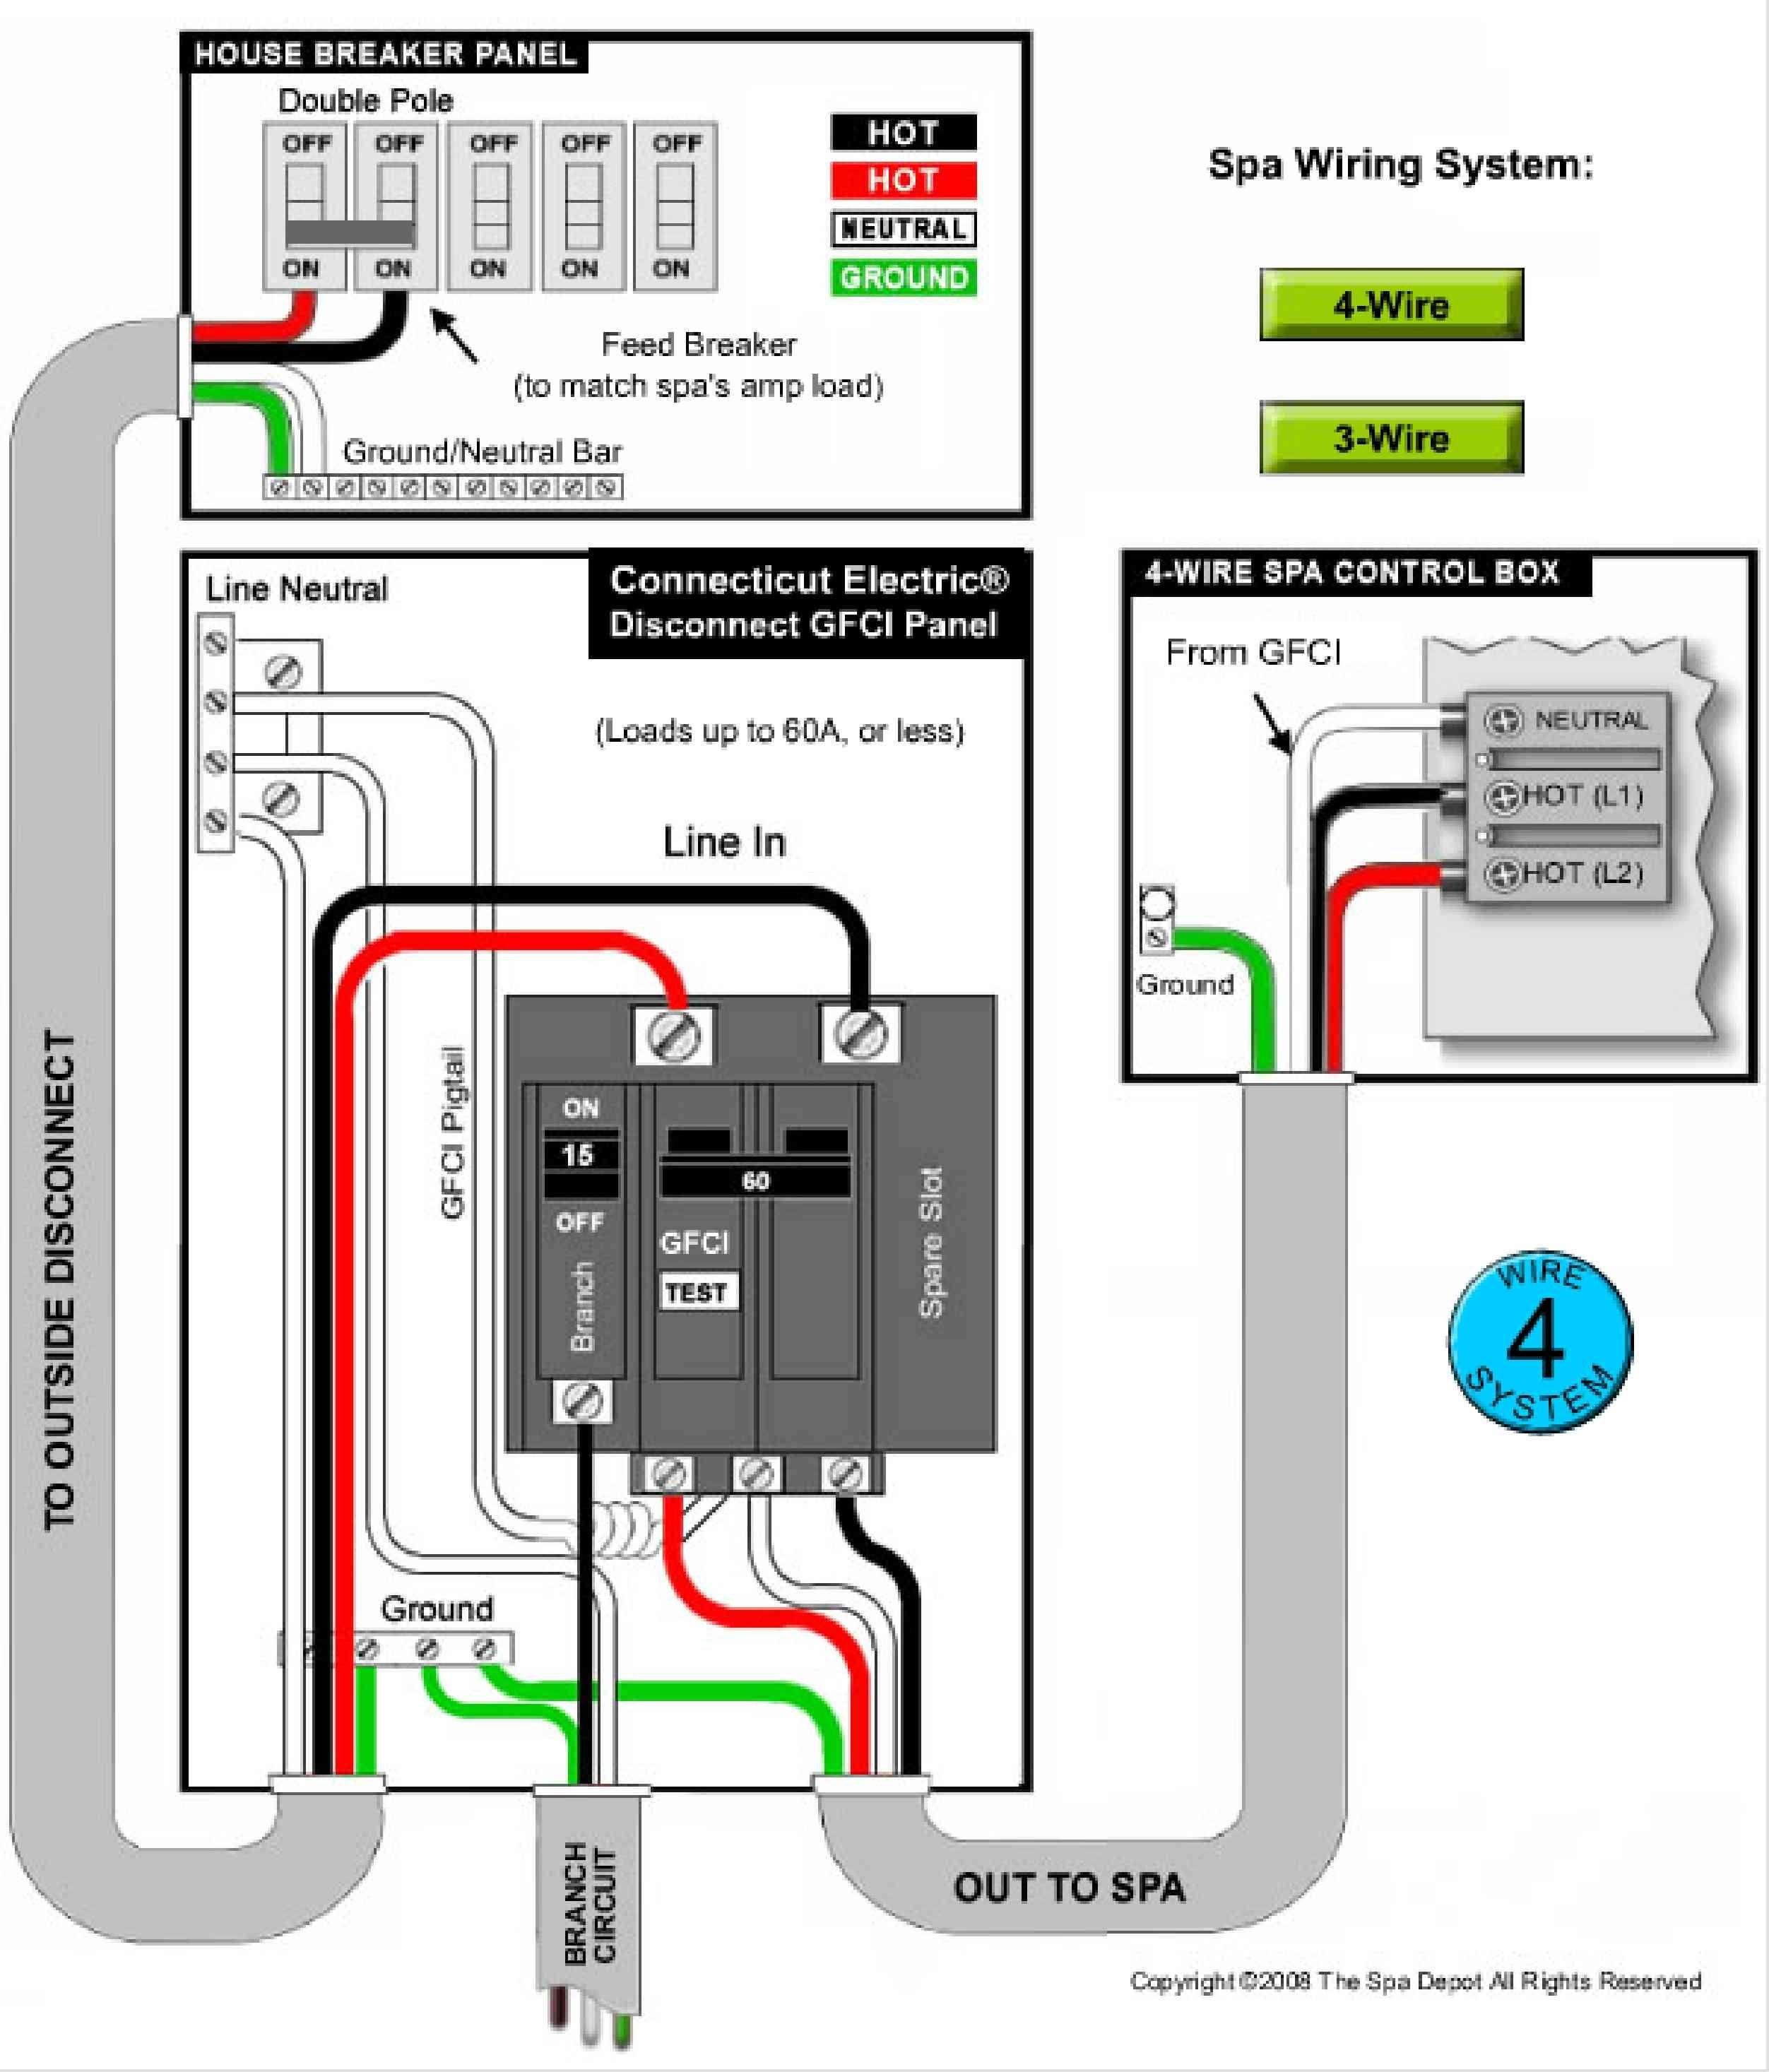 220v Hot Tub Wiring Diagram - Hot Tub Wiring Diagram Collection Luxury Hot Tub Wiring Diagram 14 I Download Wiring Diagram Detail Name Hot Tub 4k